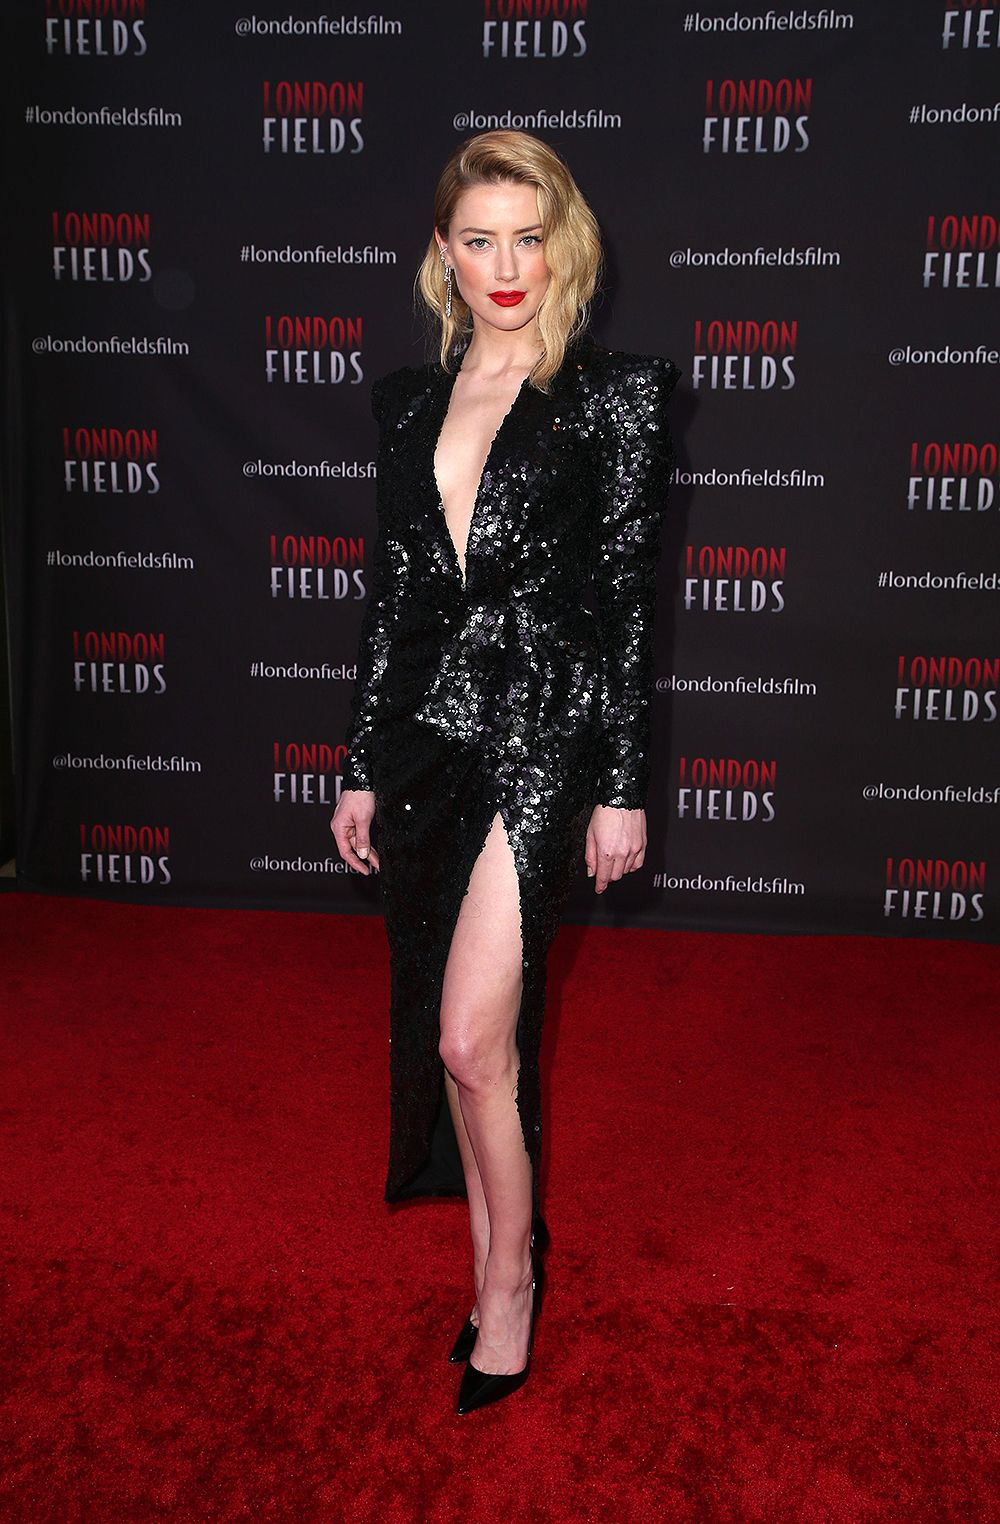 Amber Heard Pics Amber Heard London Fields Long Sleeve Dress